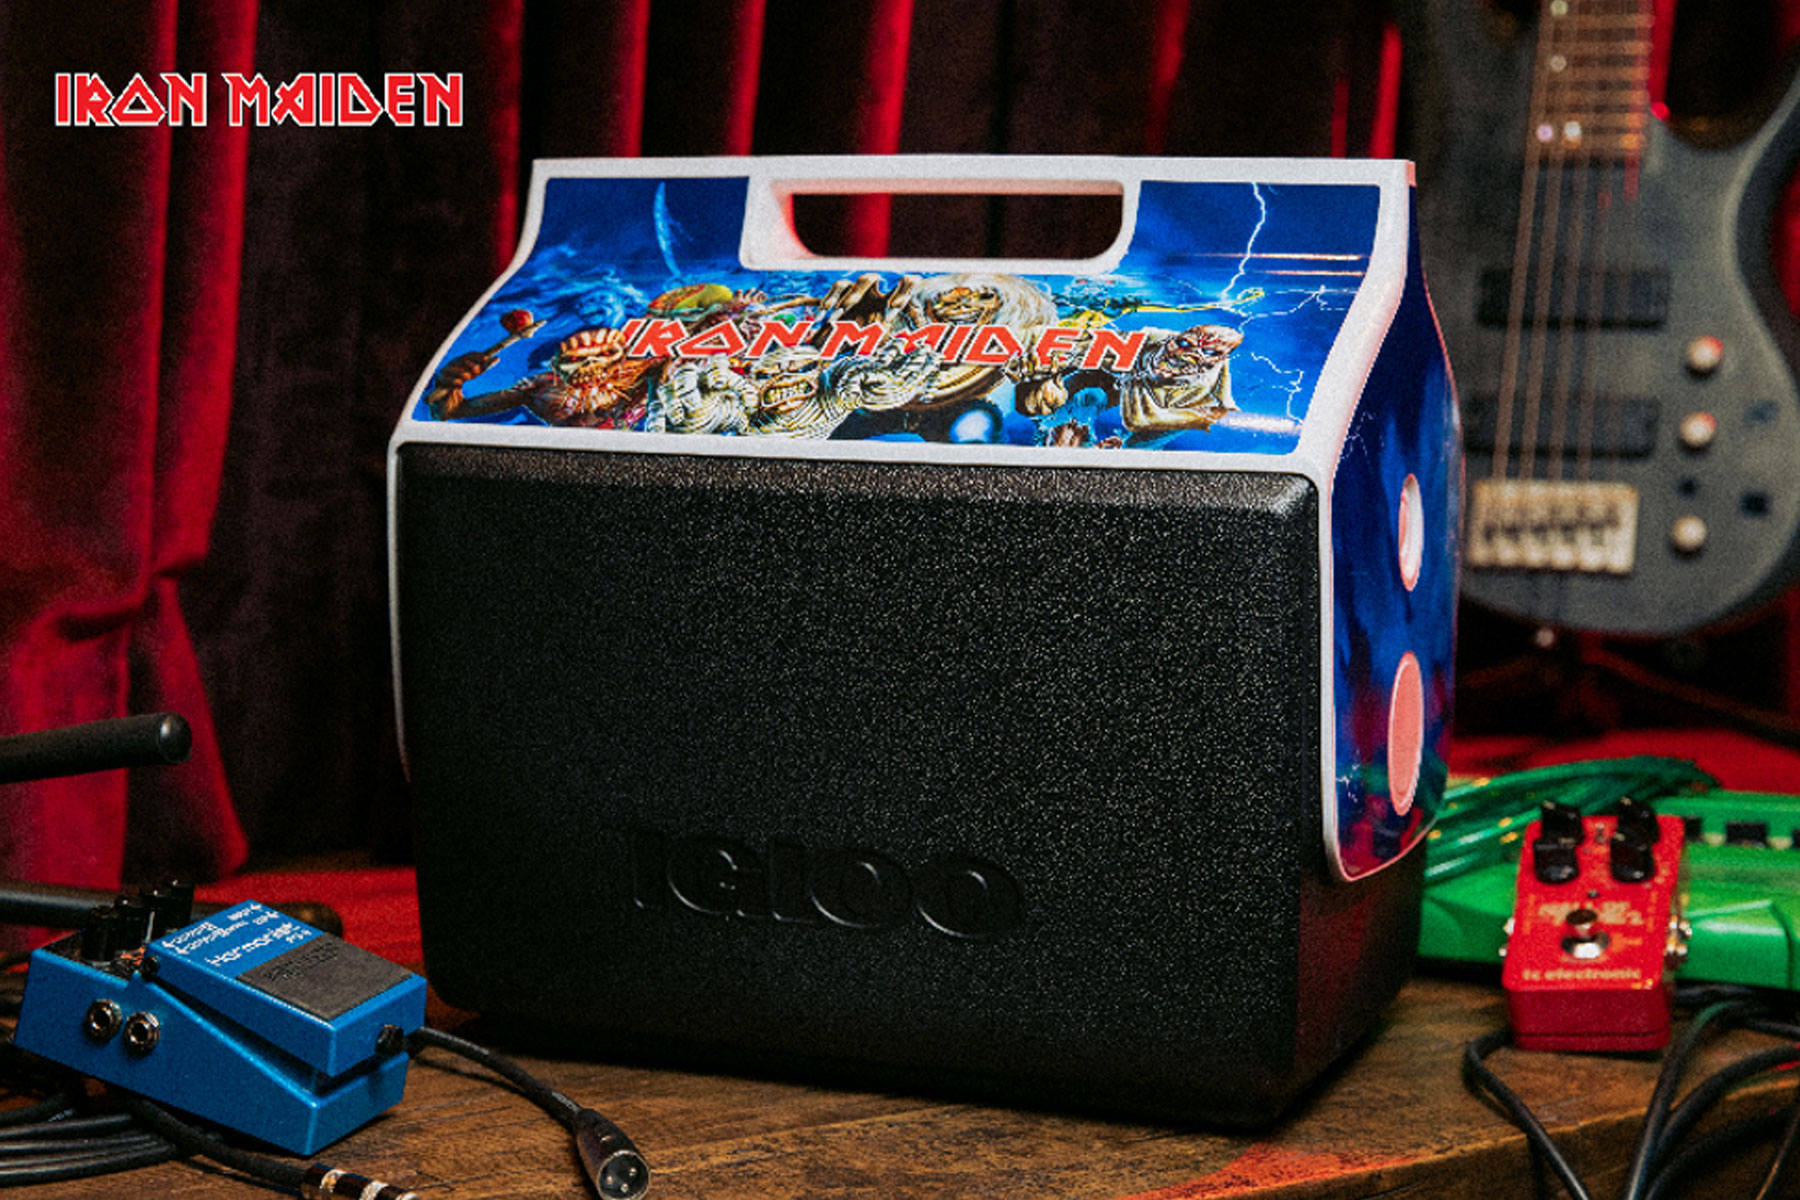 Iron Maiden Playmate cooler